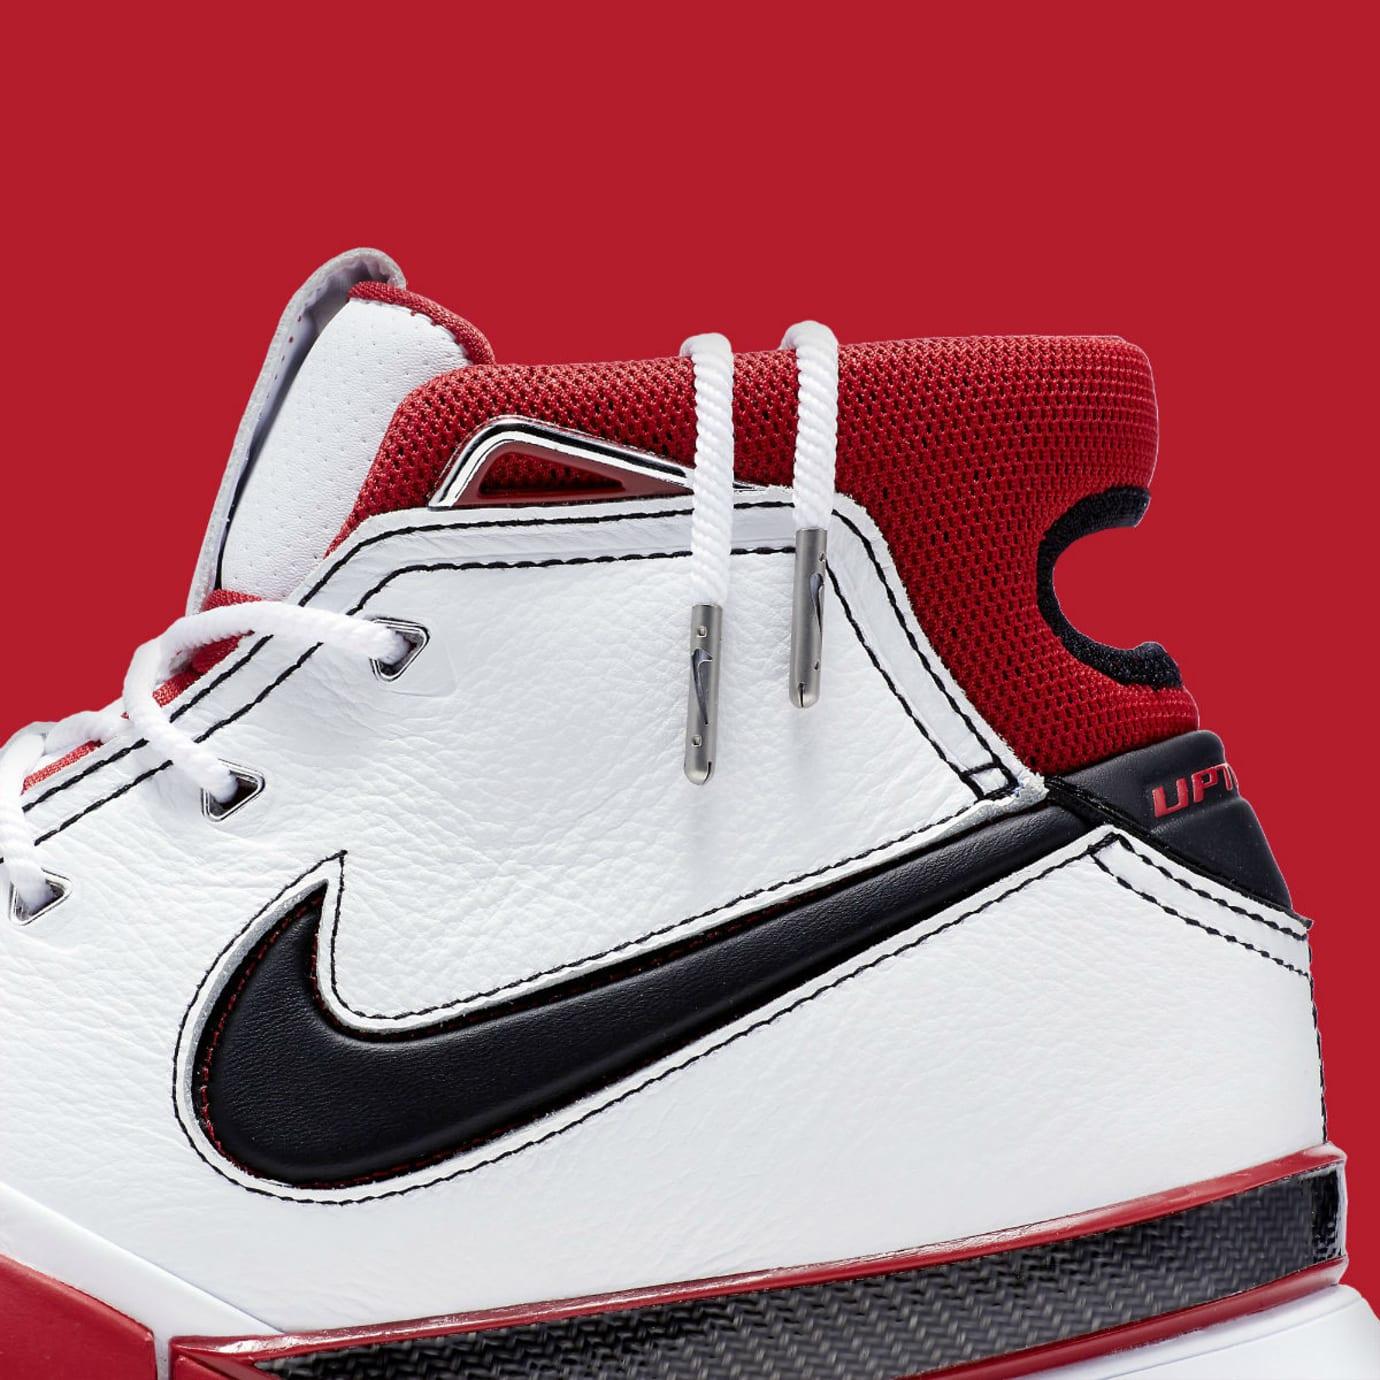 b39a0229bff9 Image via Nike Nike Zoom Kobe 1 Protro All-Star Release Date AQ2728-102  Collar